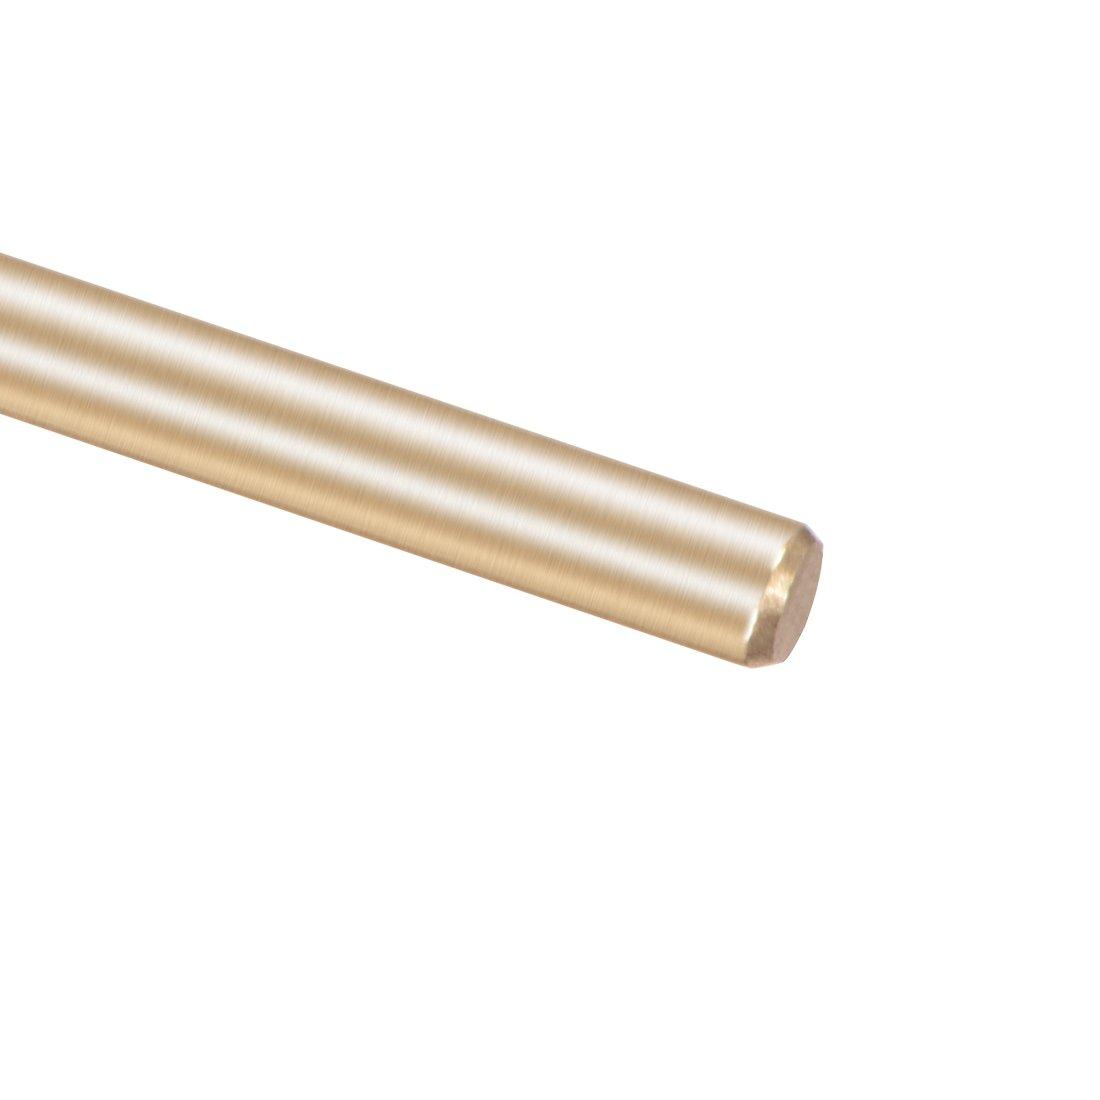 1//2-Inch Milescraft 5319 Mushroom Wood Button